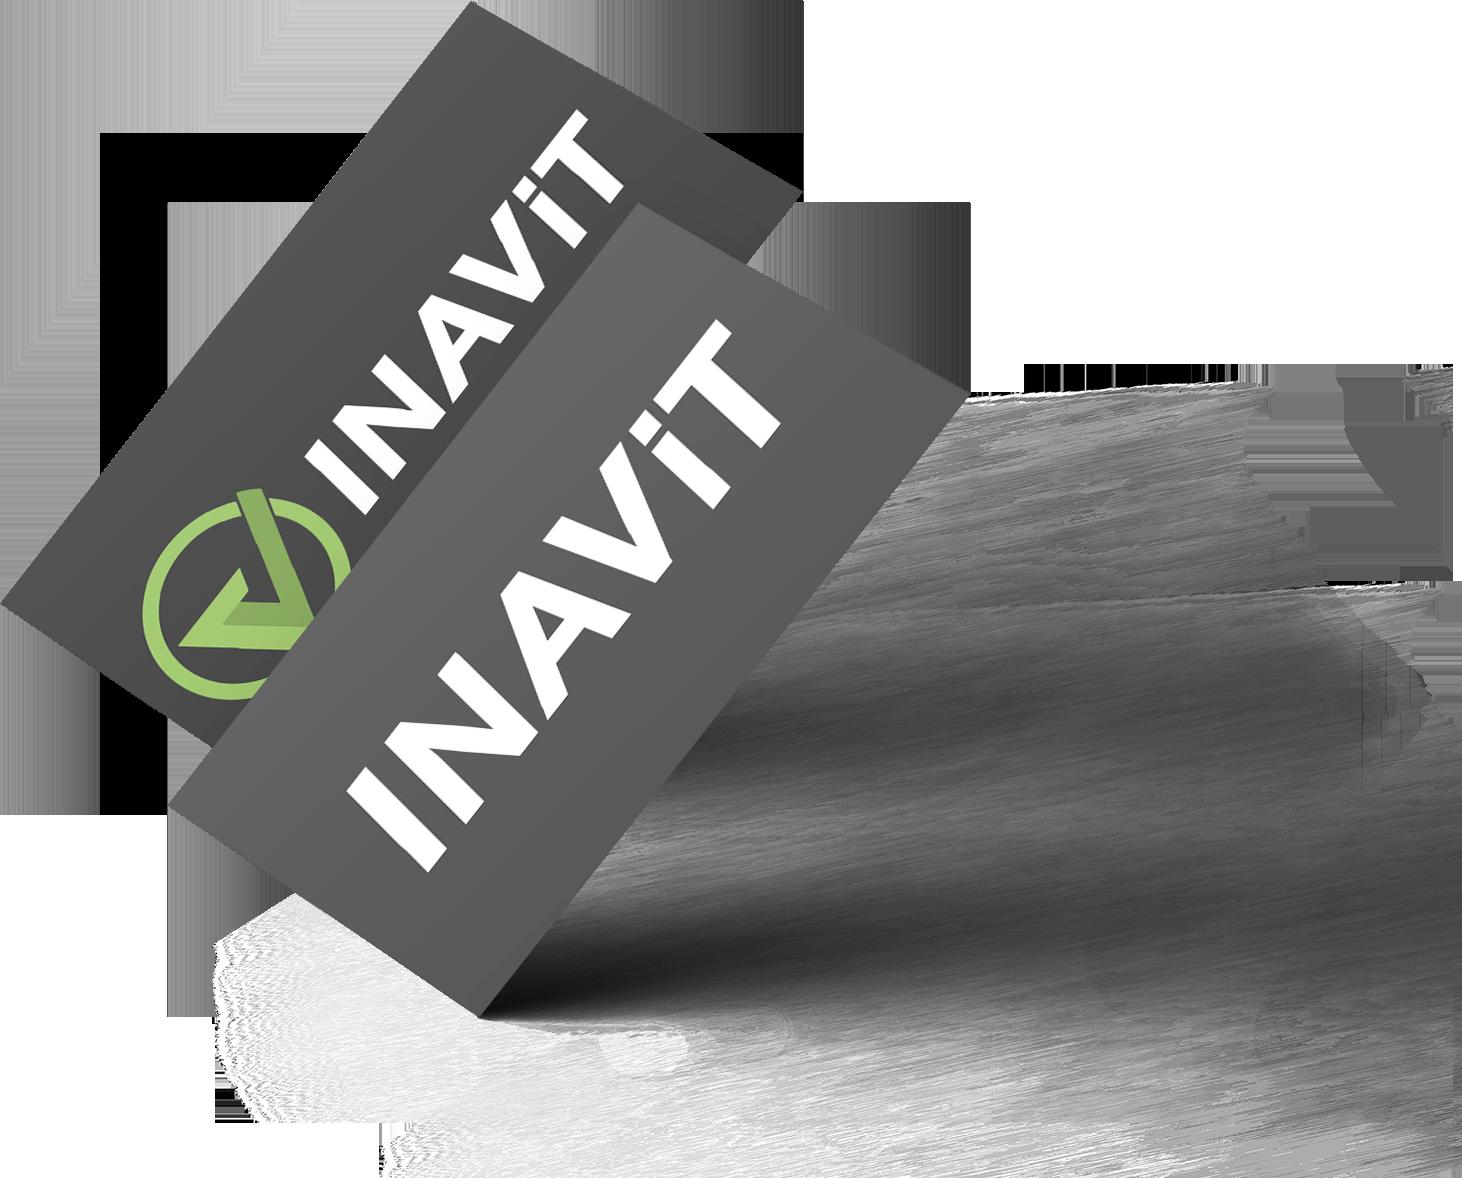 Inavit design & print